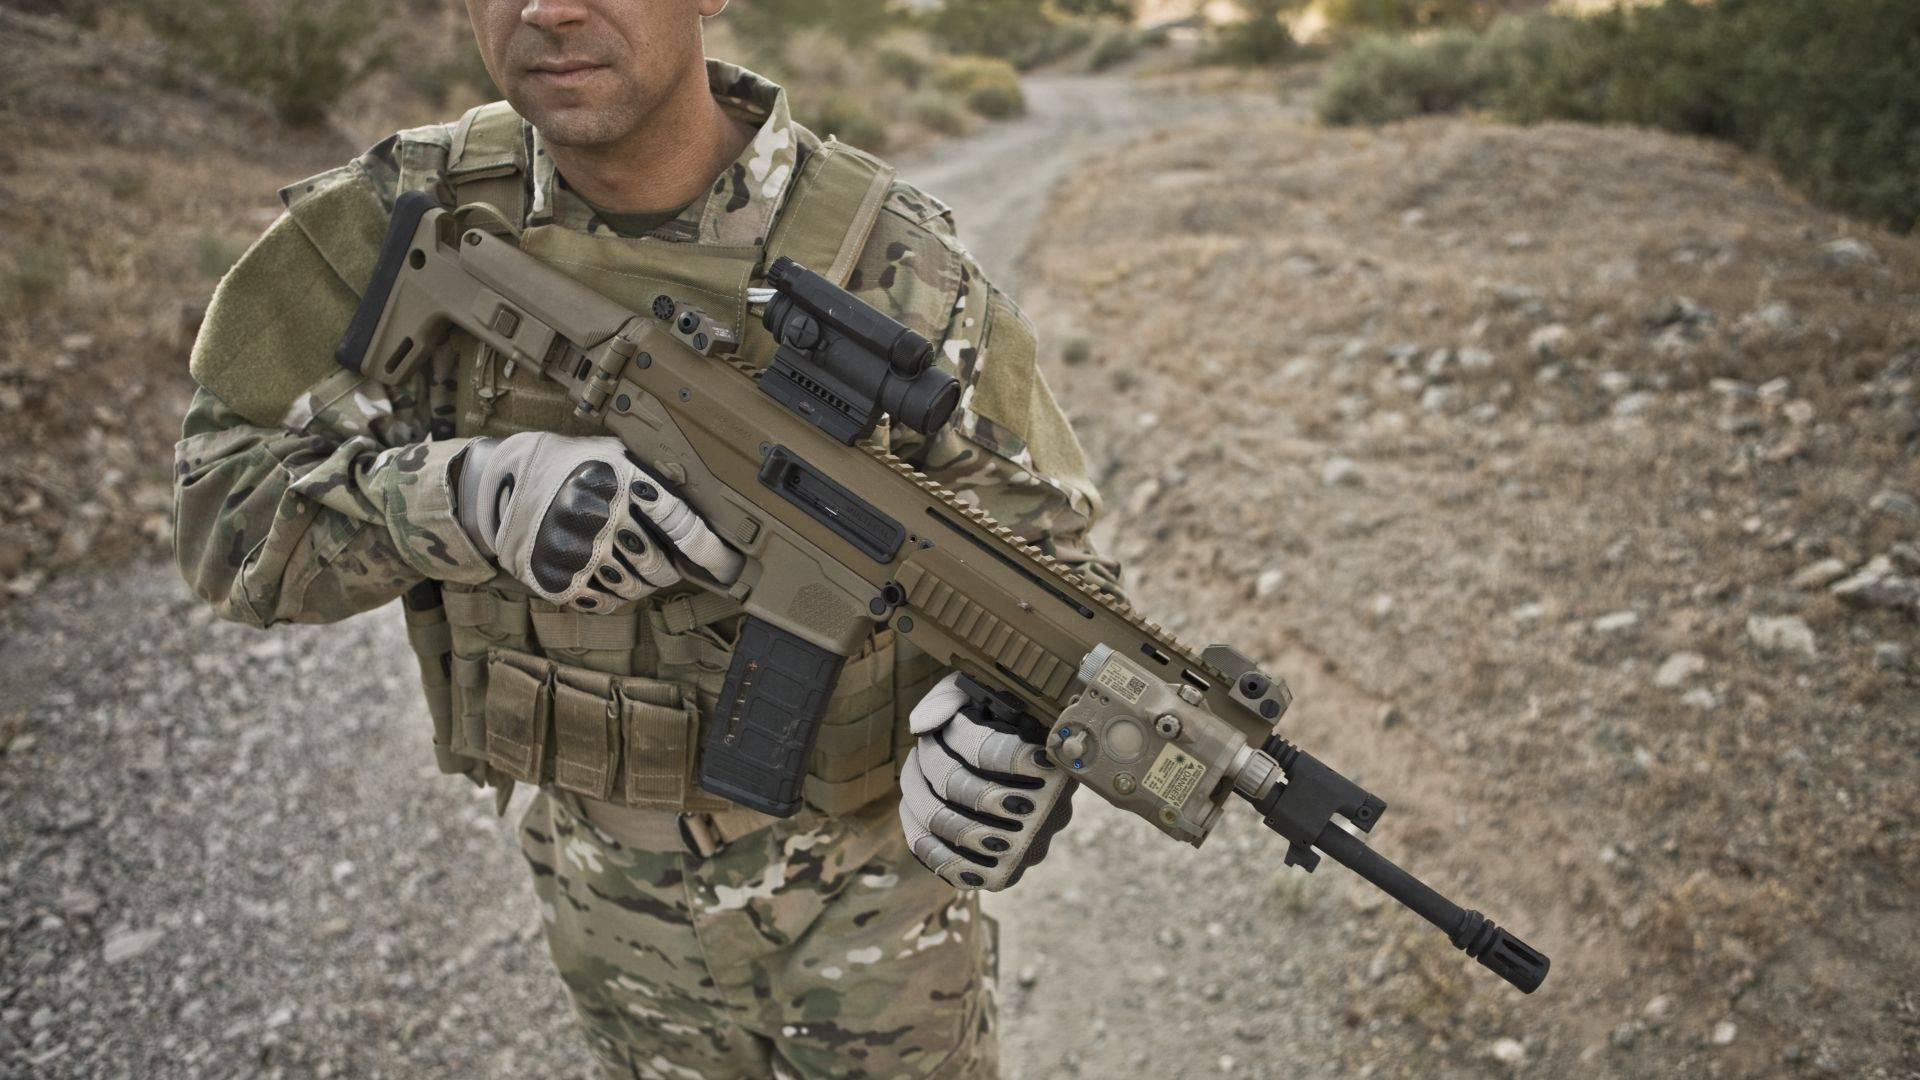 Видео: штурмовая винтовка fn fal